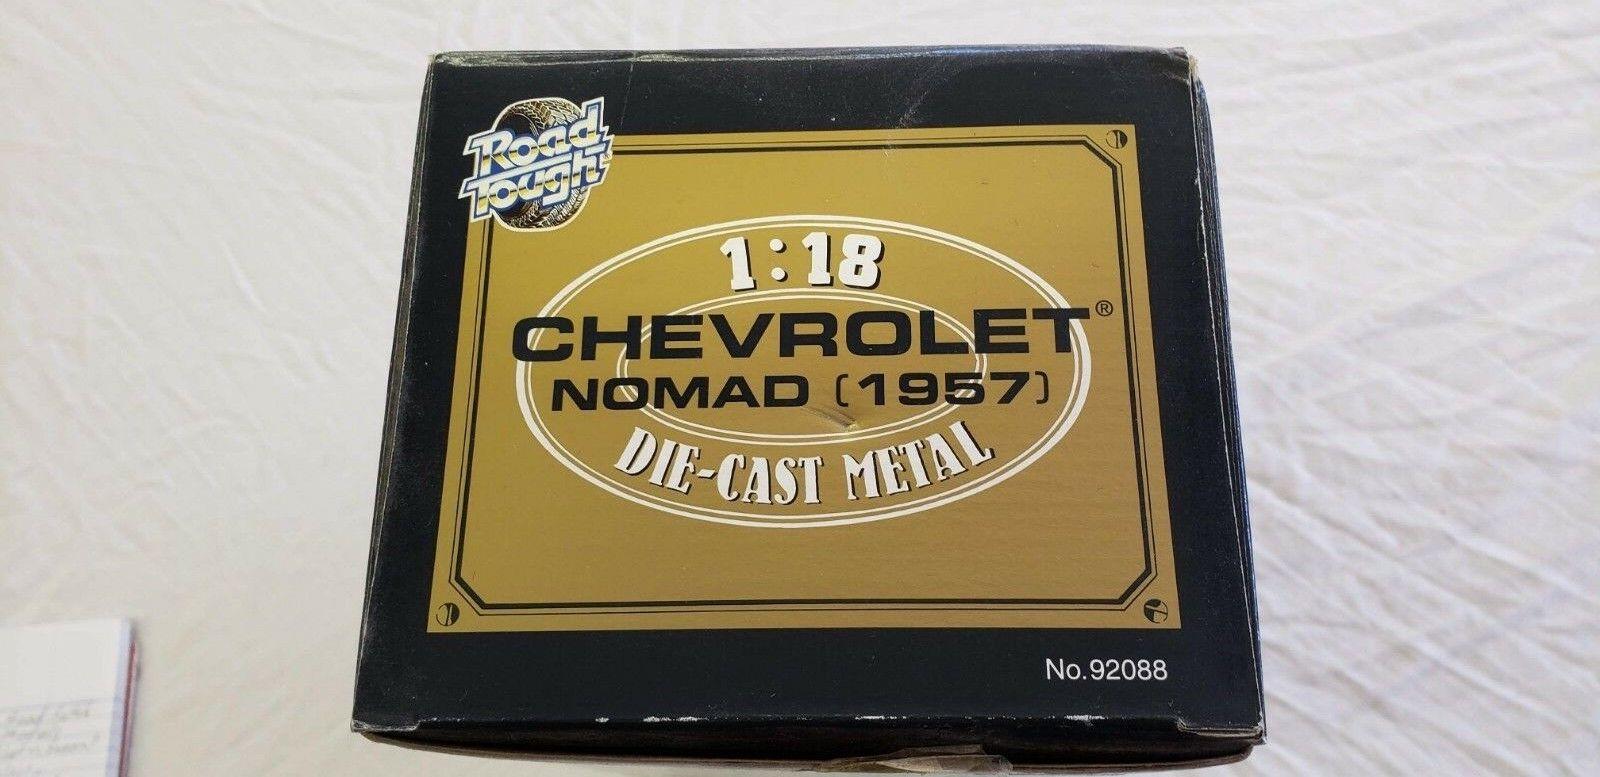 1957 Chevrolet Chevrolet Chevrolet Nomad Die Cast Metal Model 9208 bc893c